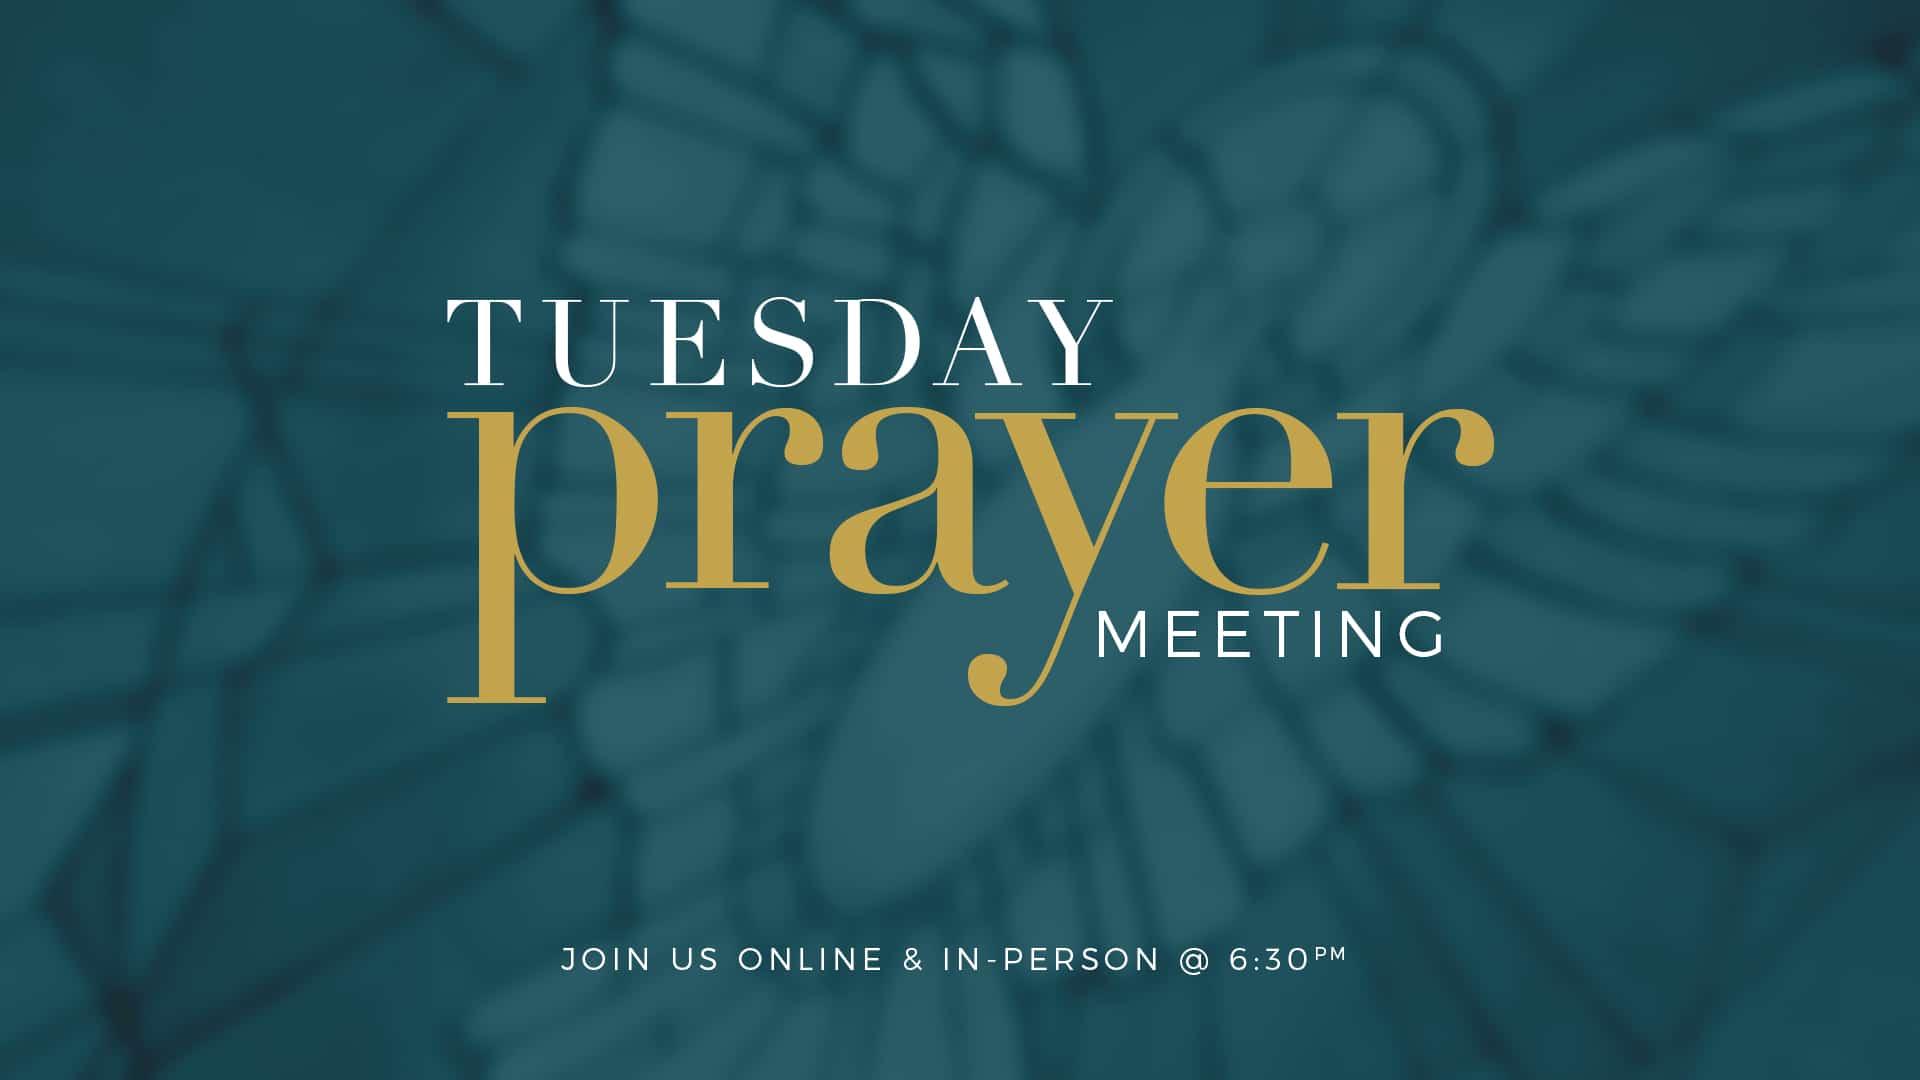 Brooklyn Tabernacle Tuesday Prayer Meeting Online banner